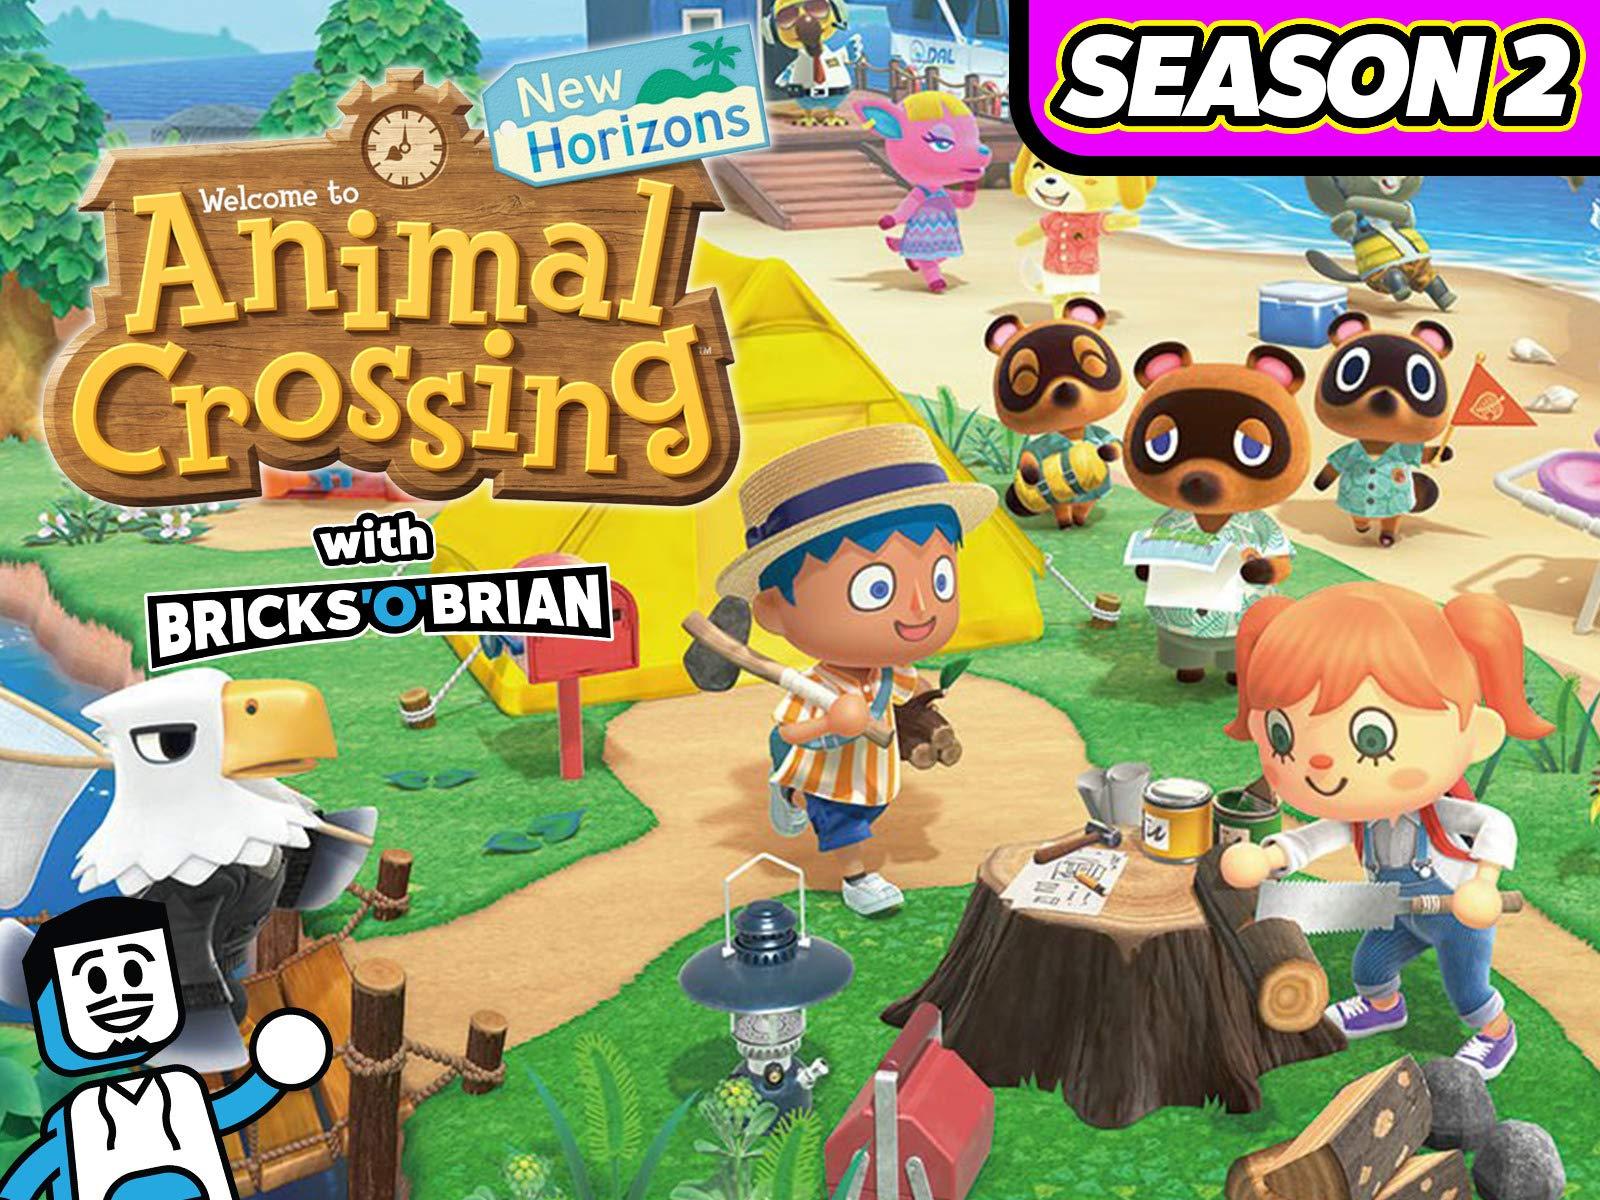 Clip: Animal Crossing New Horizons with Bricks 'O' Brian! - Season 2